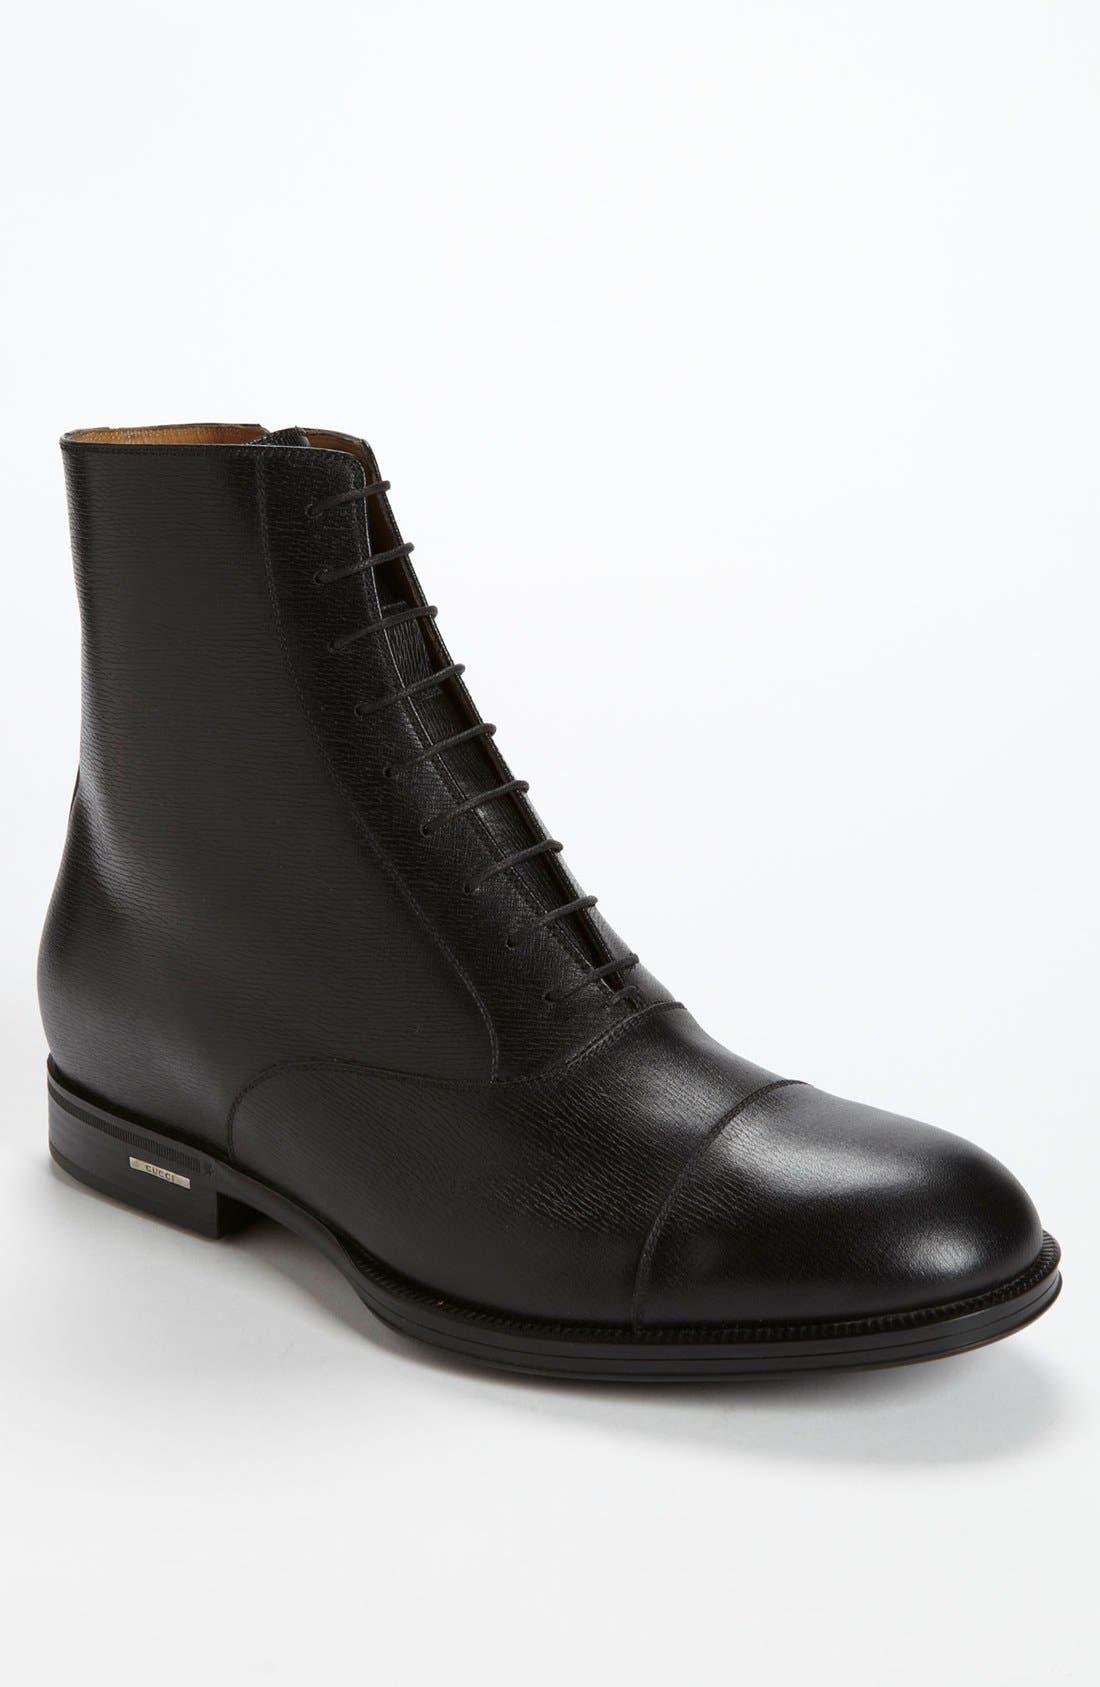 Main Image - Gucci 'Handir' Cap Toe Boot